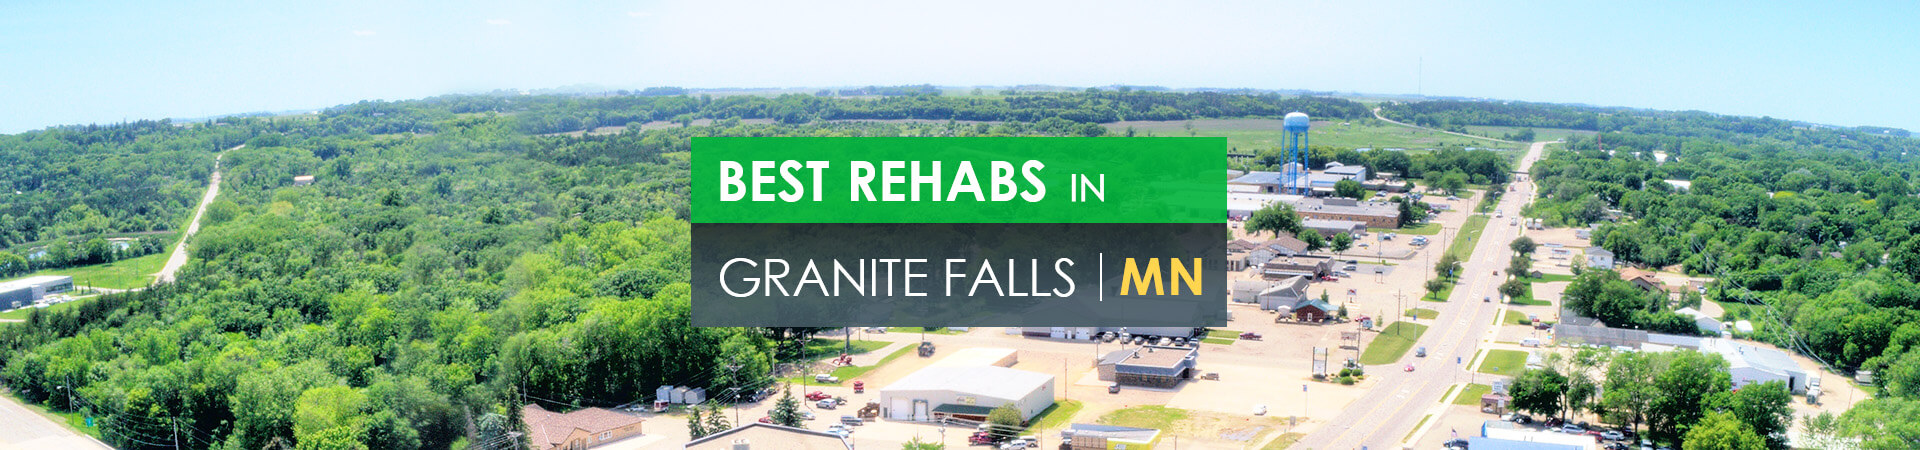 Best rehabs in Granite Falls, MN